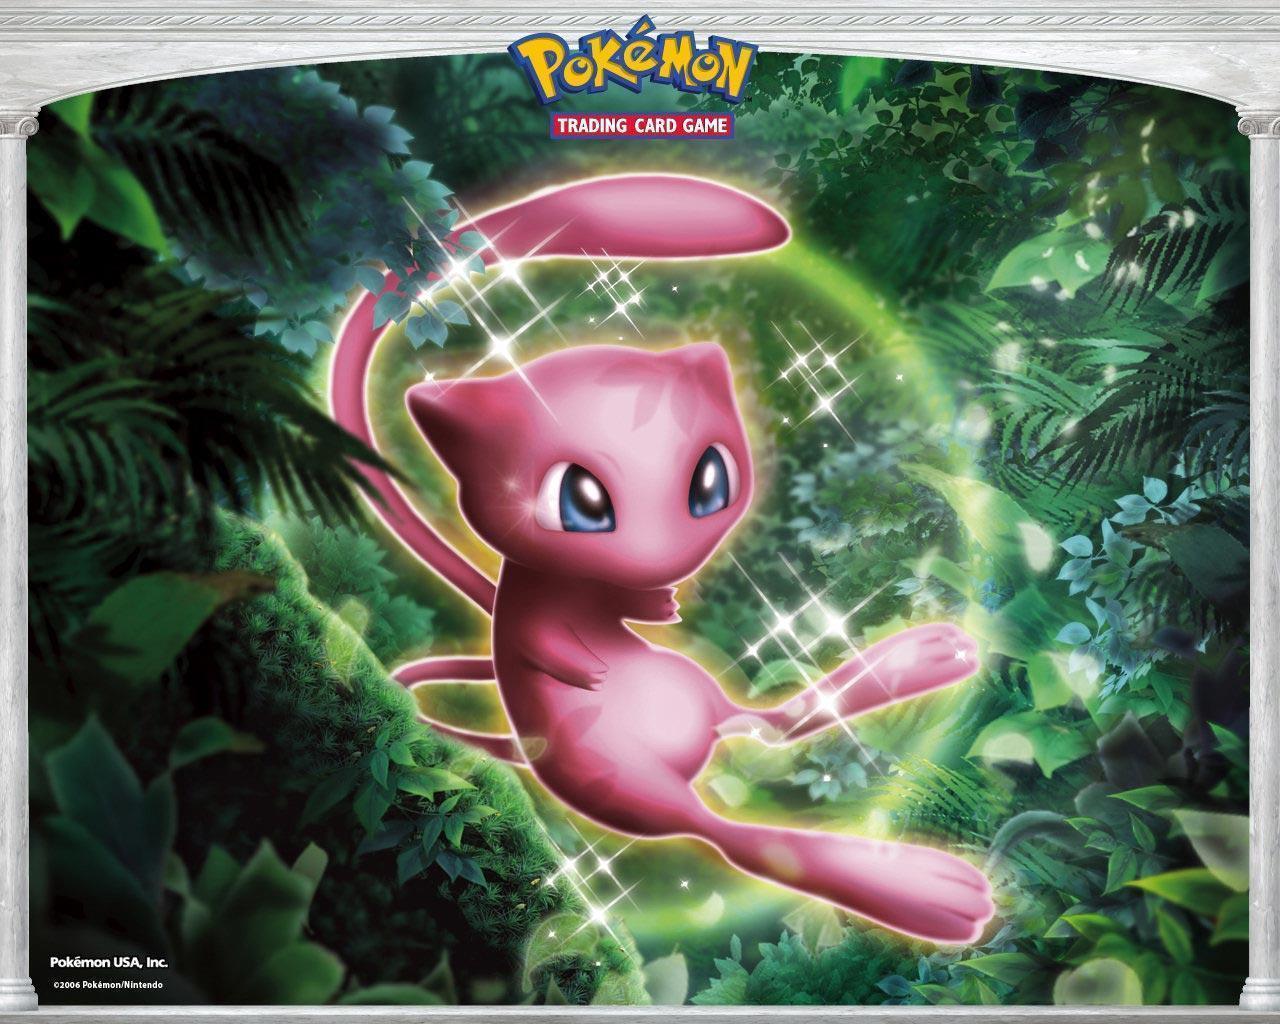 Pokemon Mew Wallpapers 1280x1024